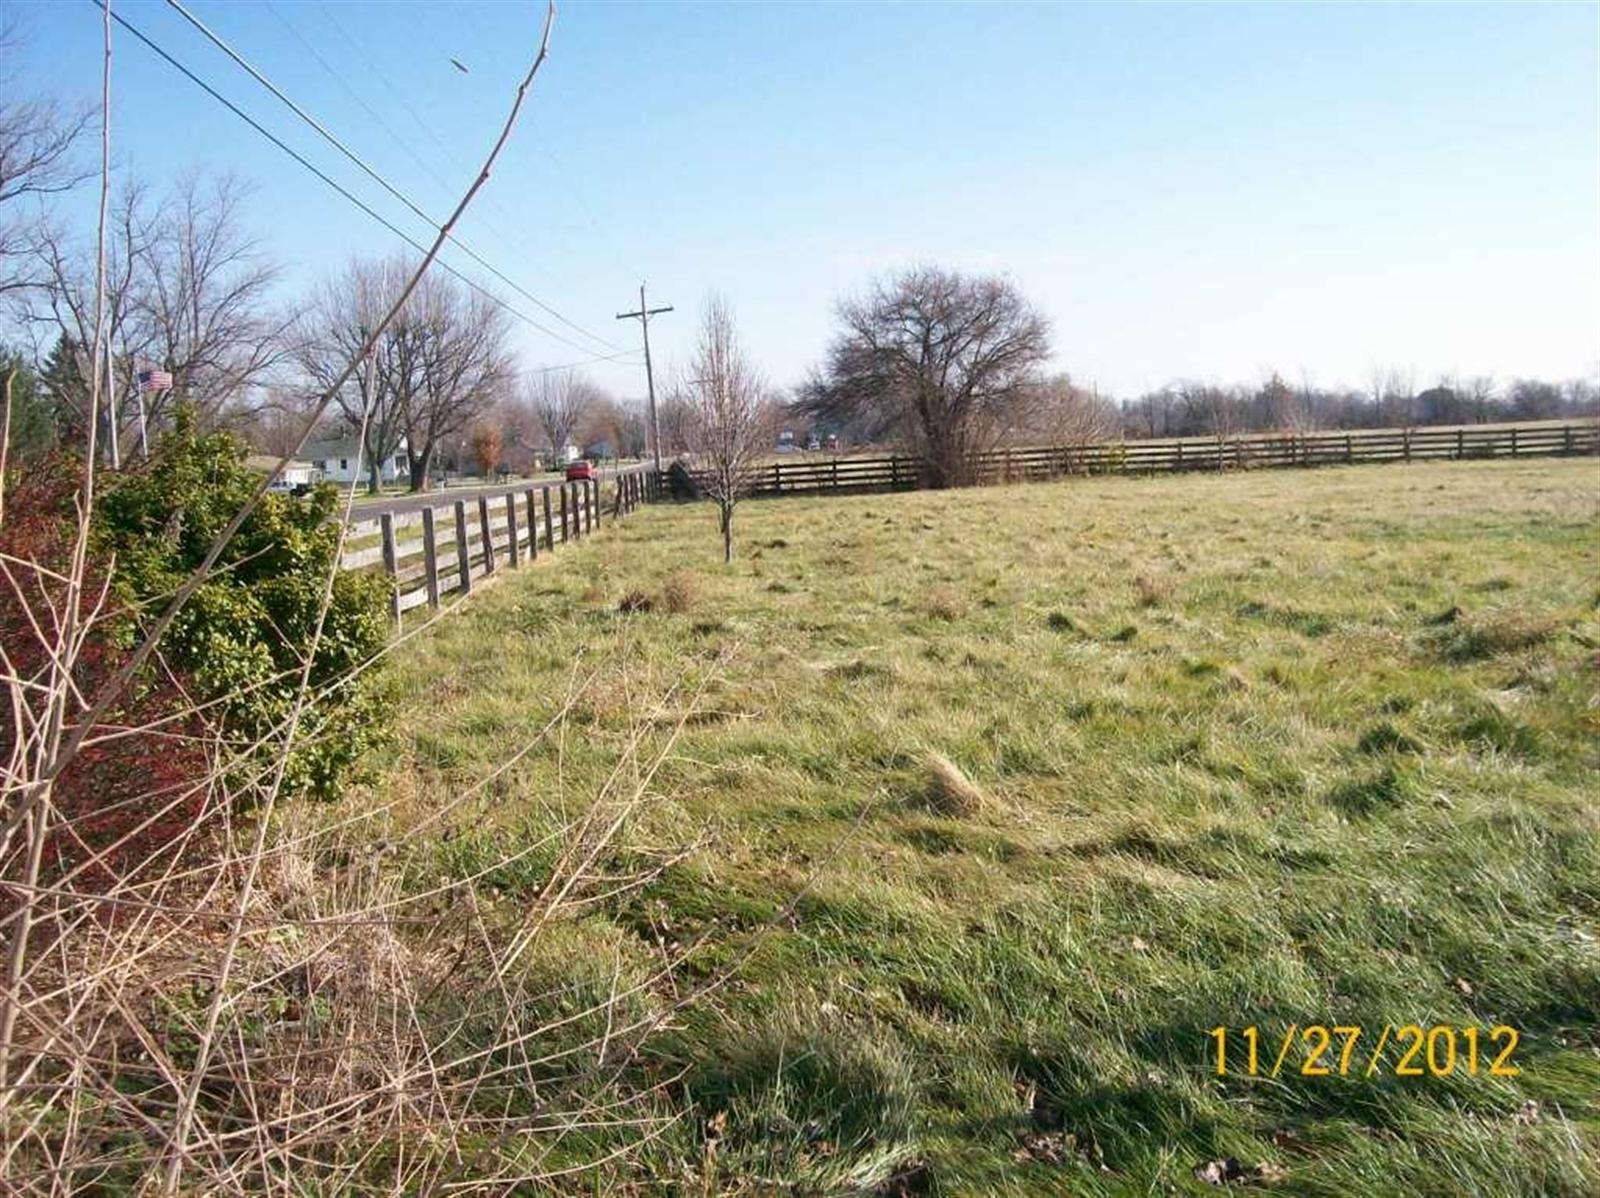 Real Estate Photography - 3077 E SR 236, ANDERSON, IN, 46011 - Location 2